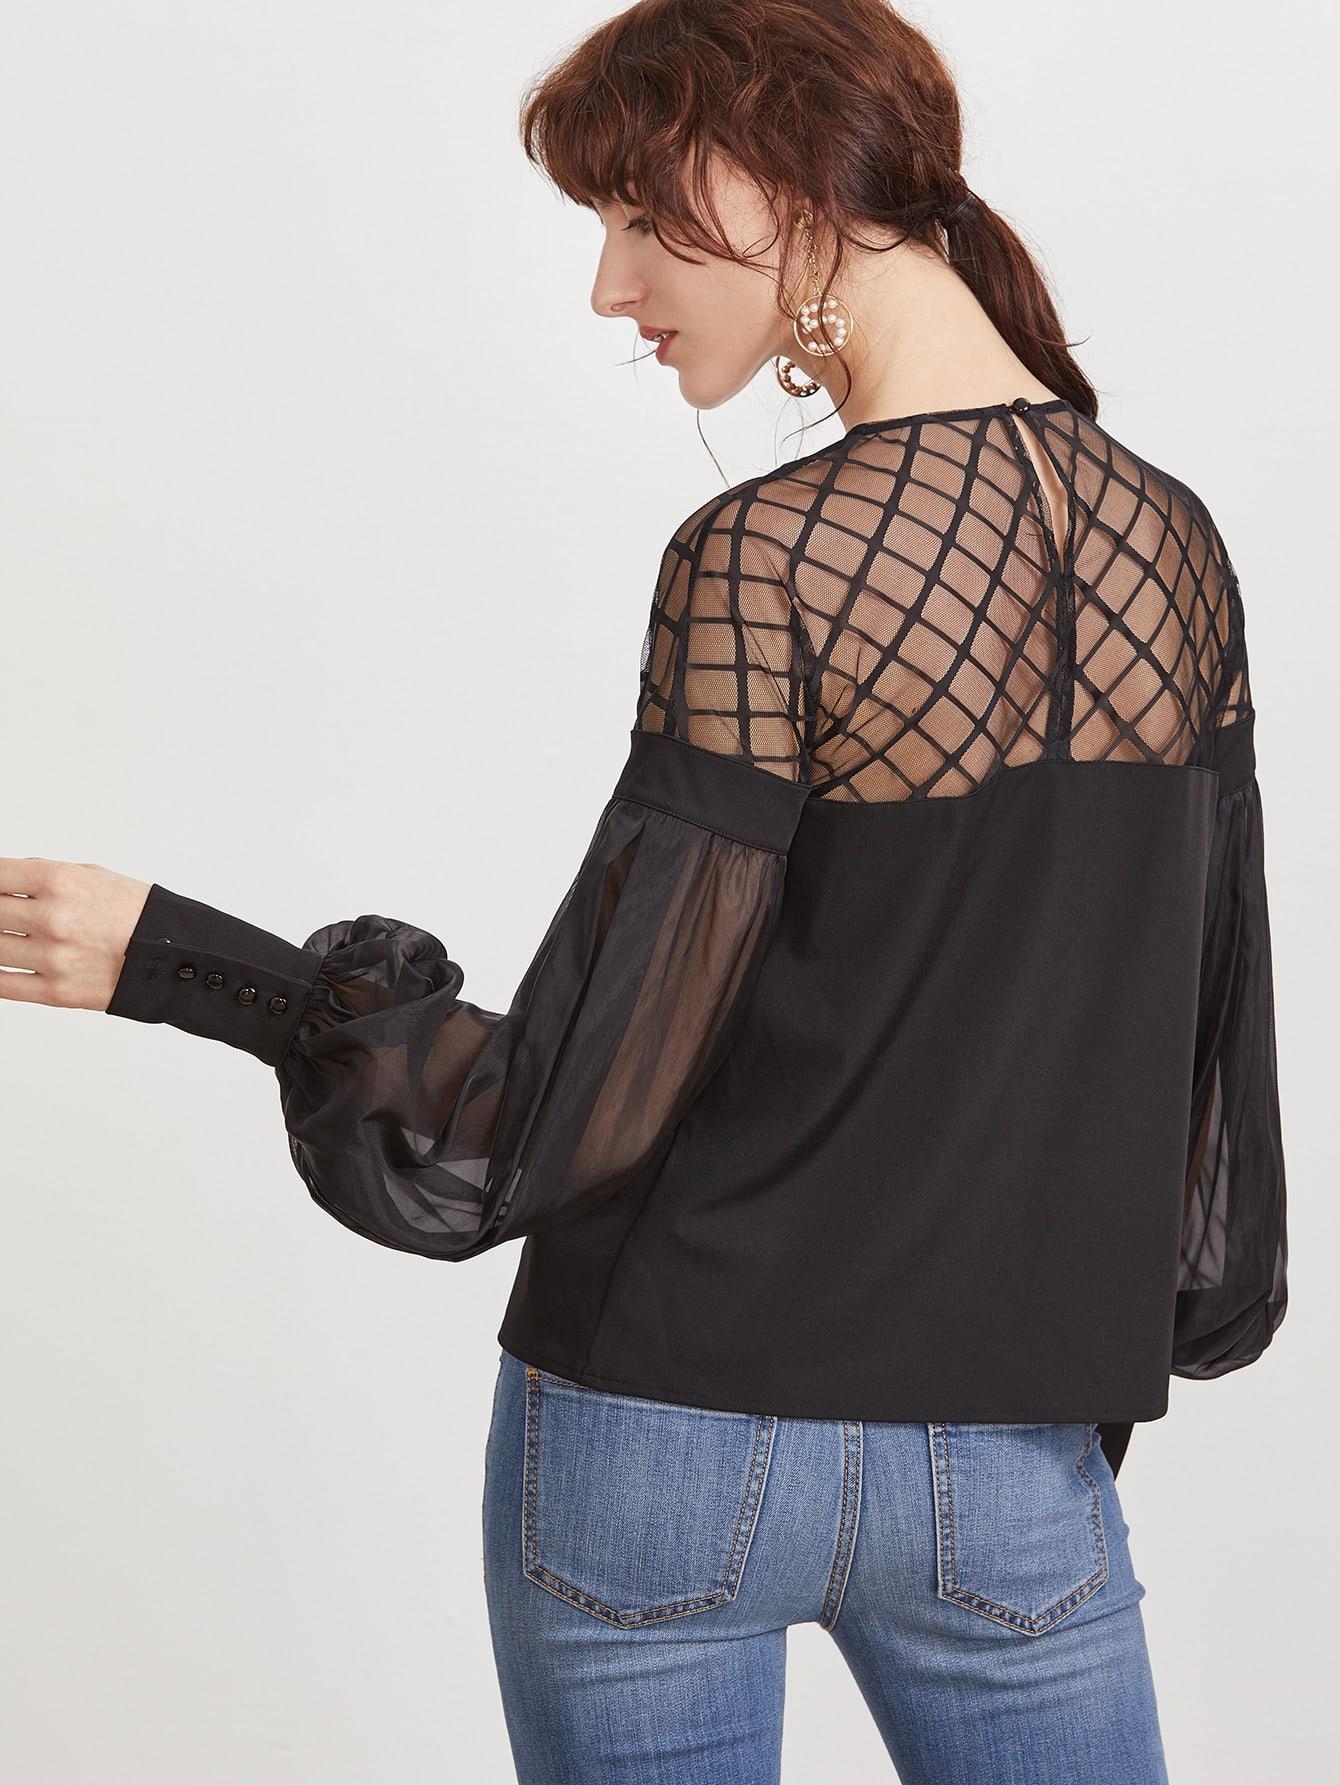 blouse161227704_2